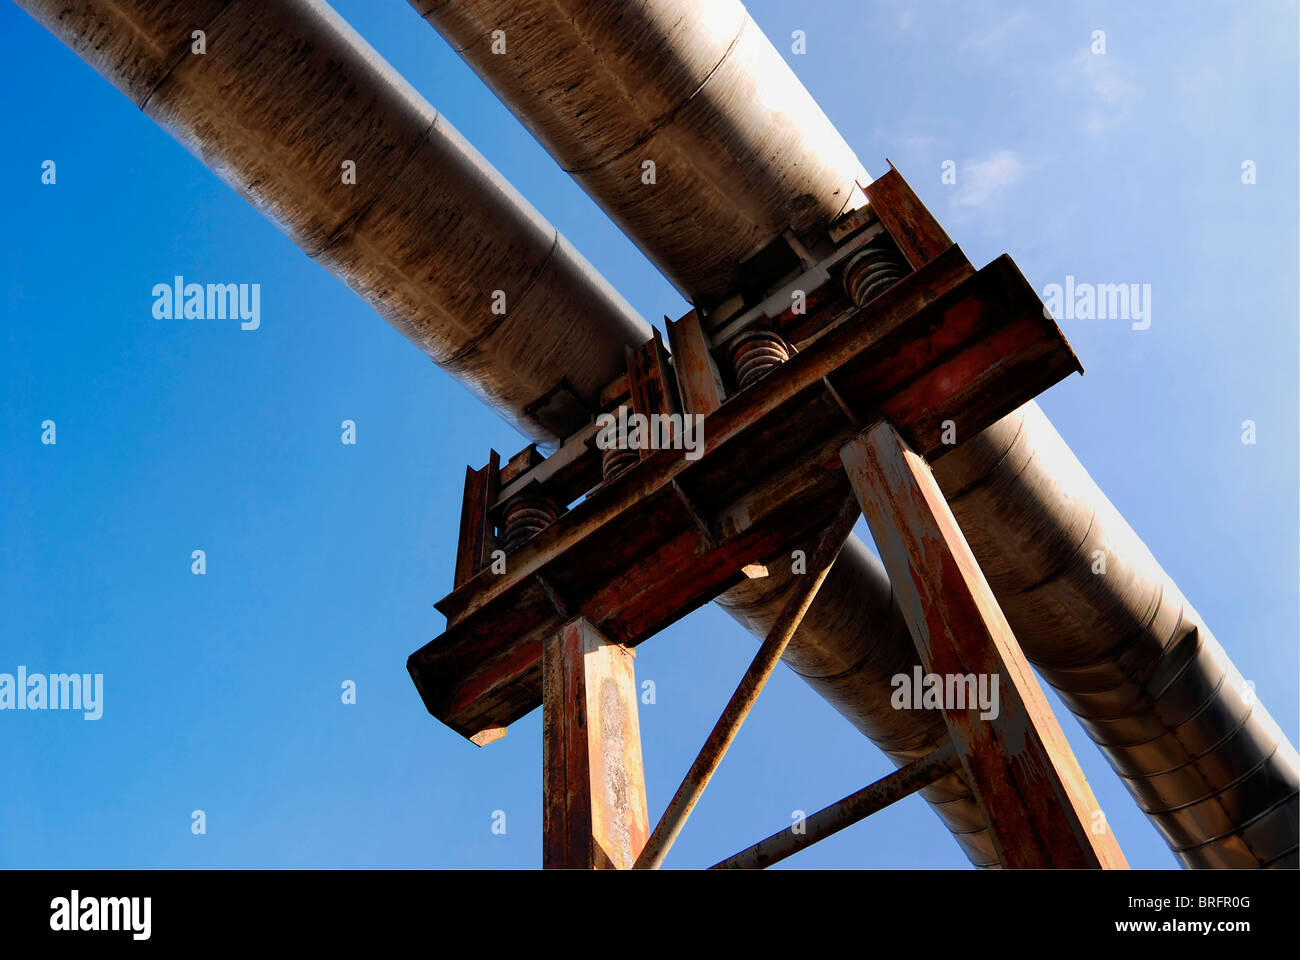 gas pipeline - Stock Image